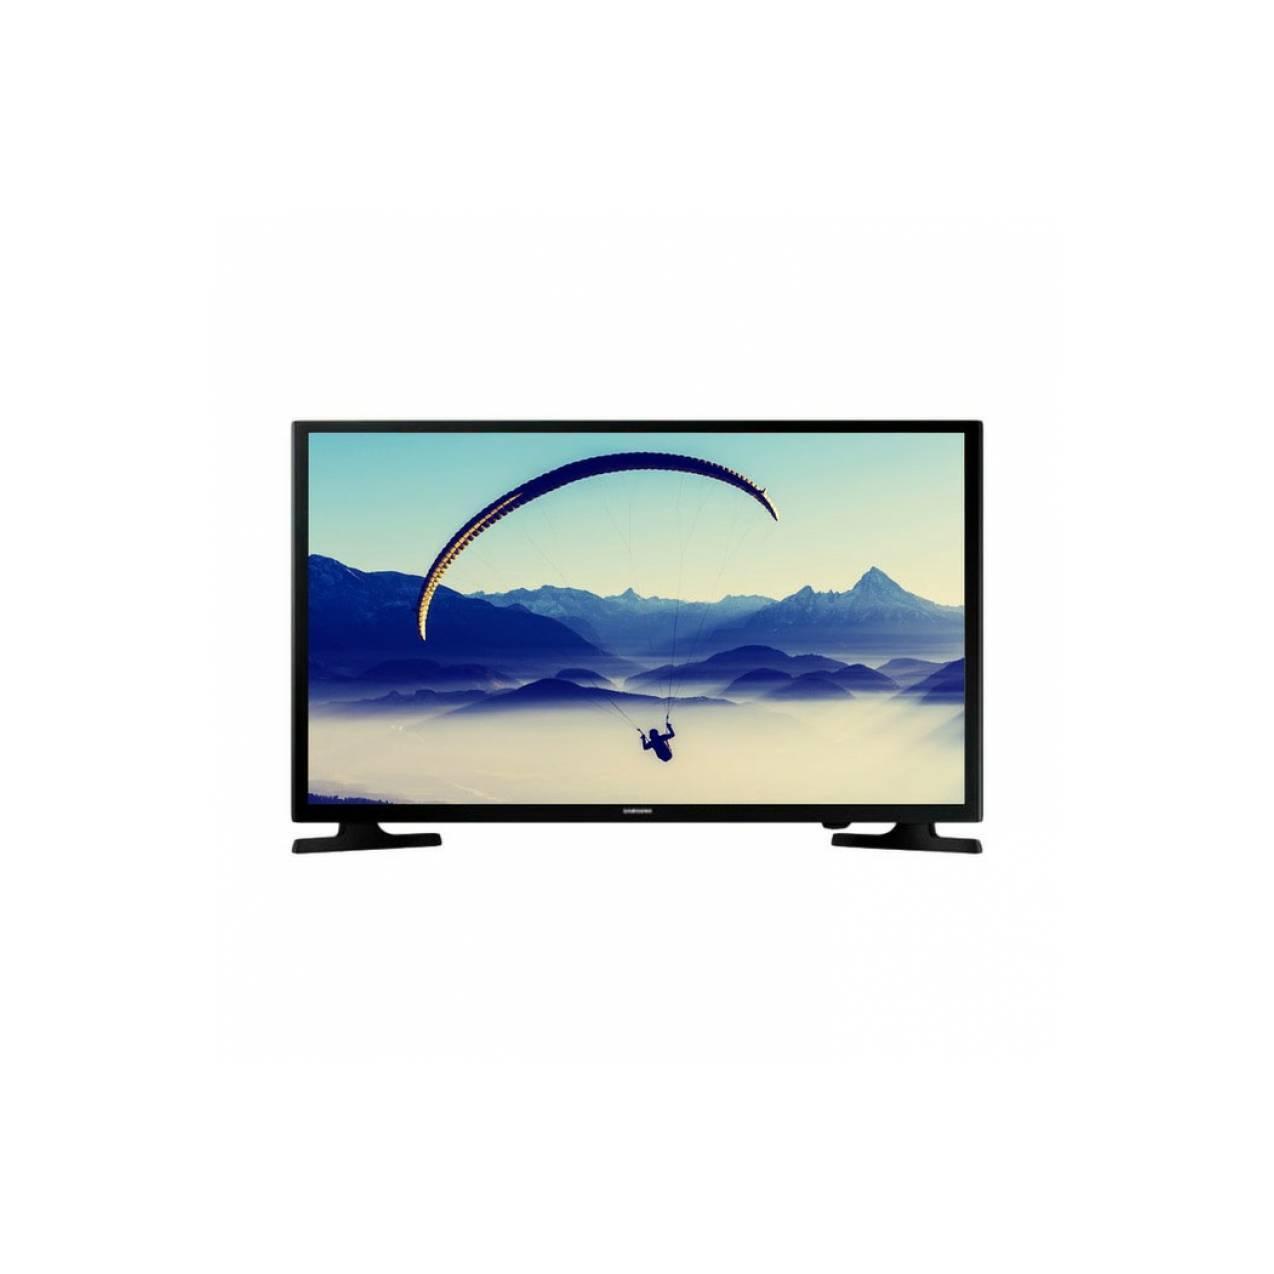 Samsung UA32J4303 / ua 32J4303 Smart TV LED [ 32 Inch /HD